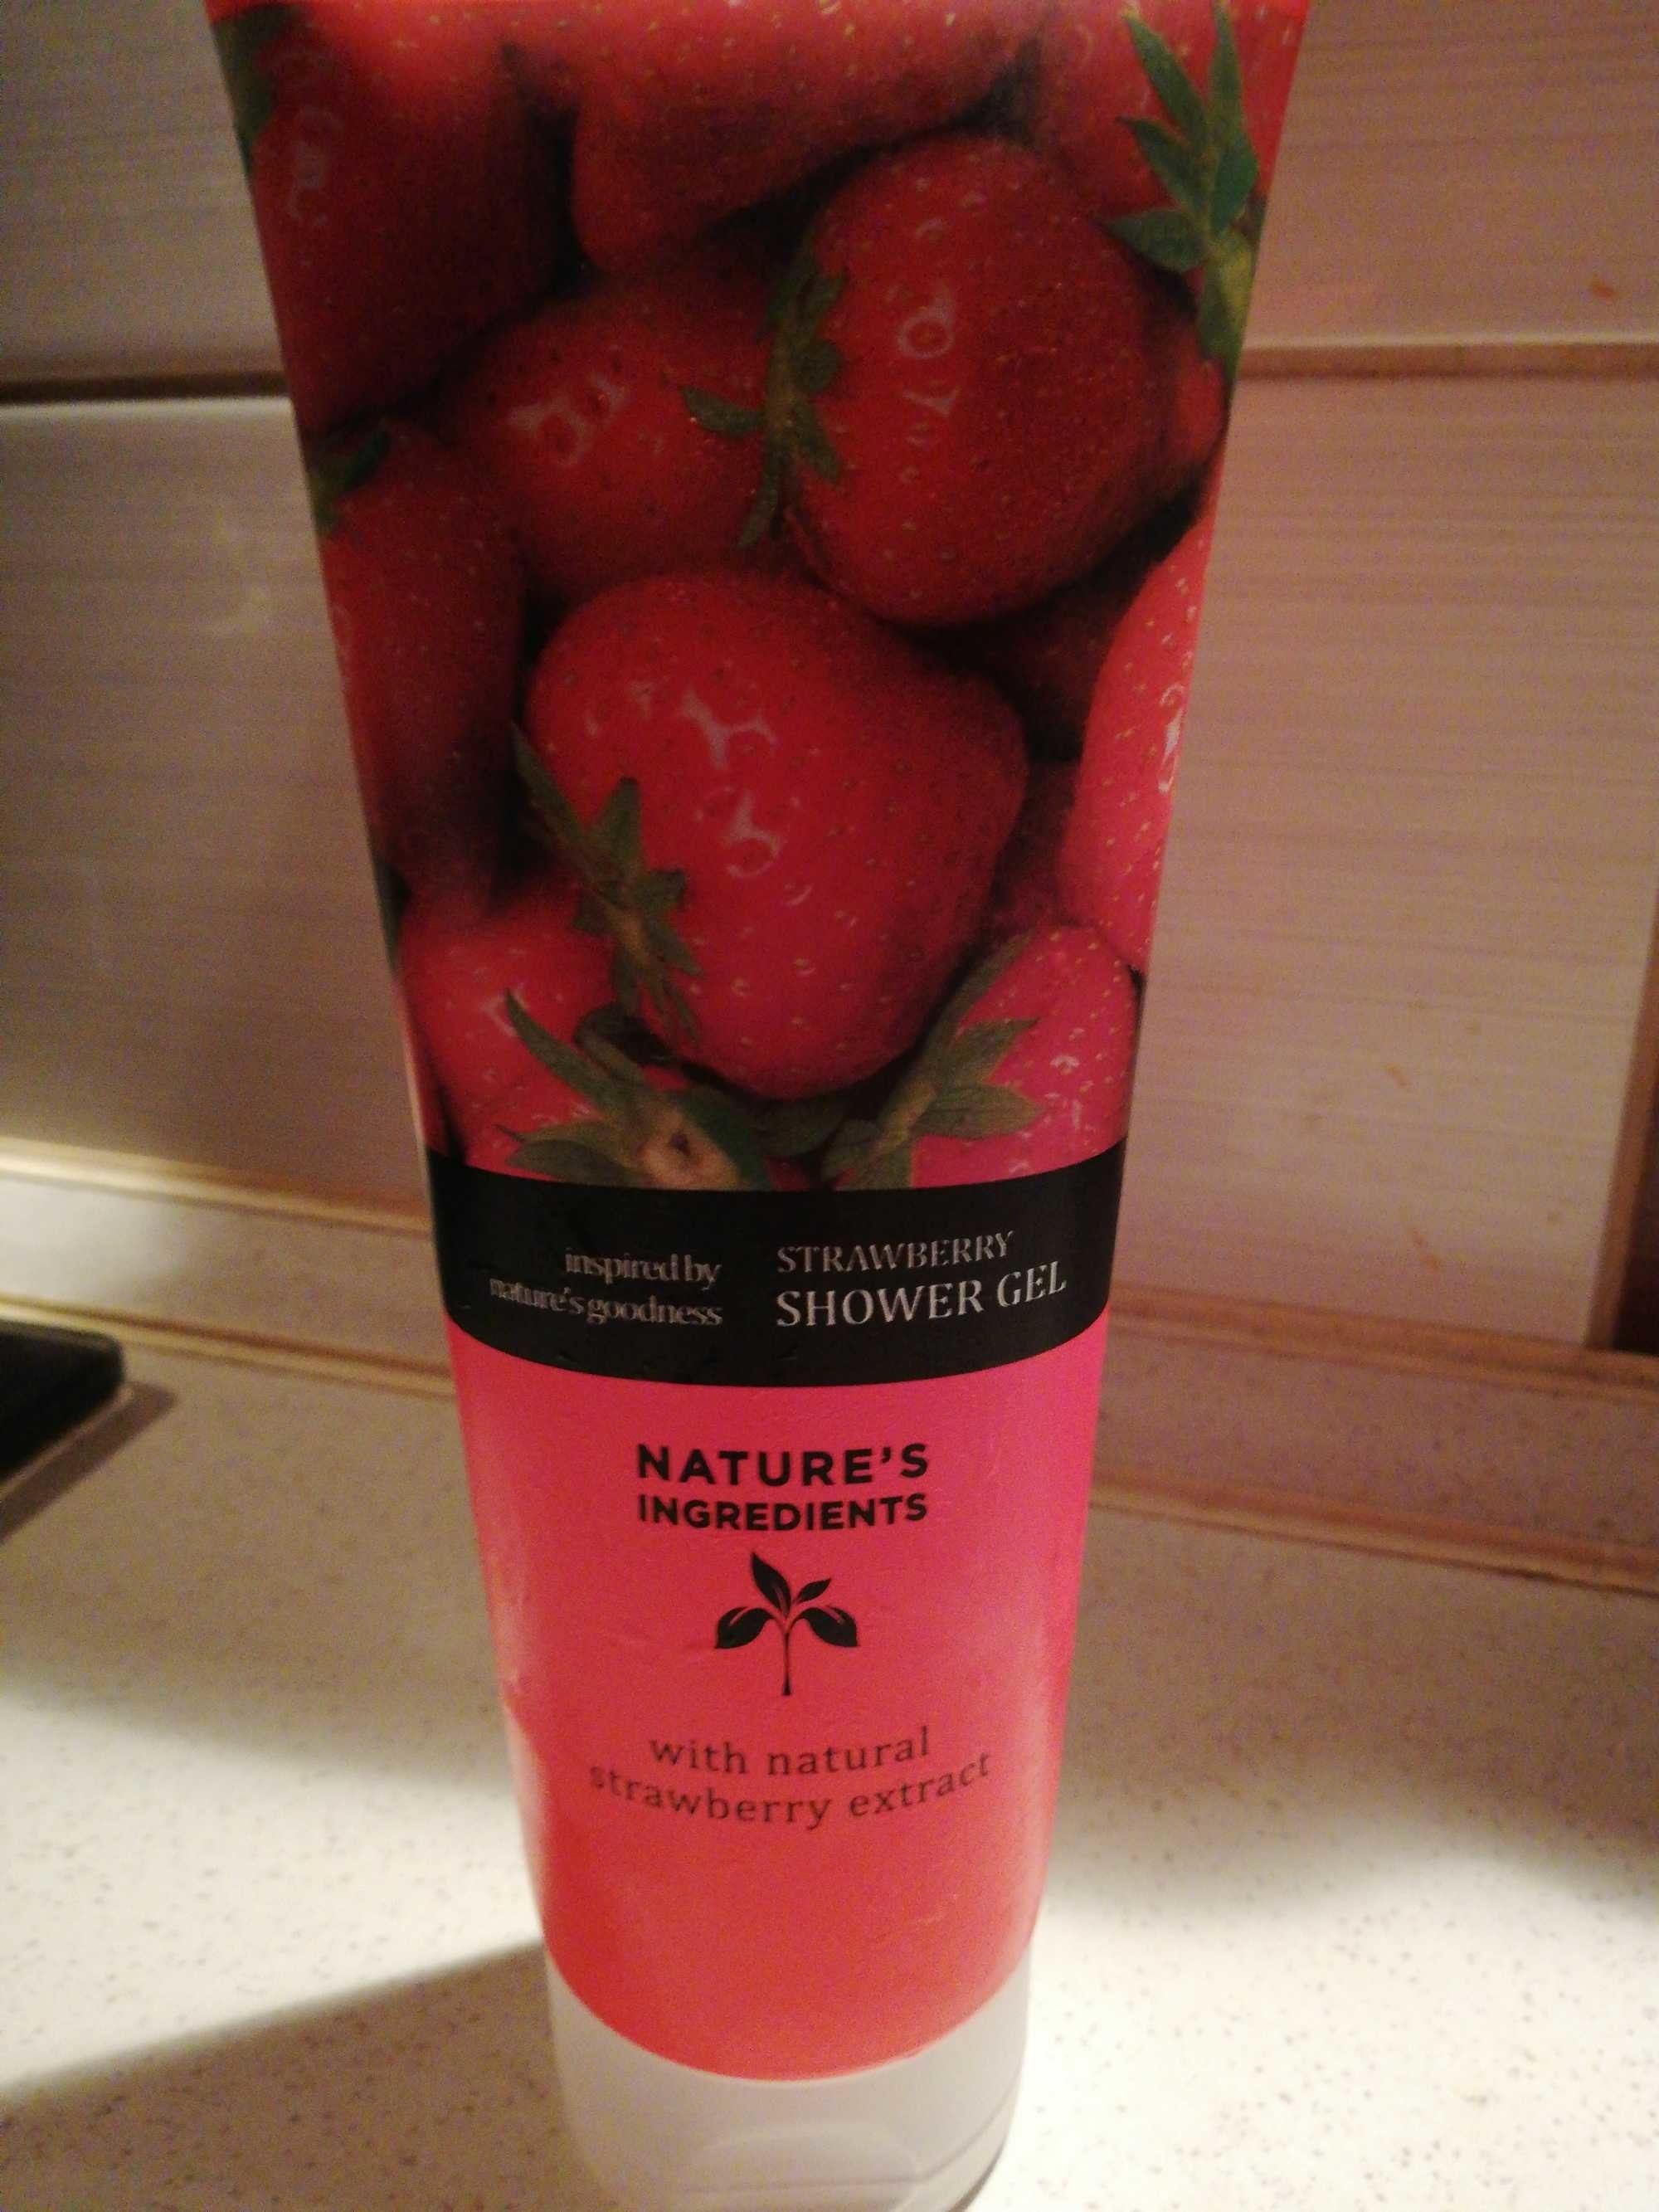 Strawbery Shower Gel - Produit - pl